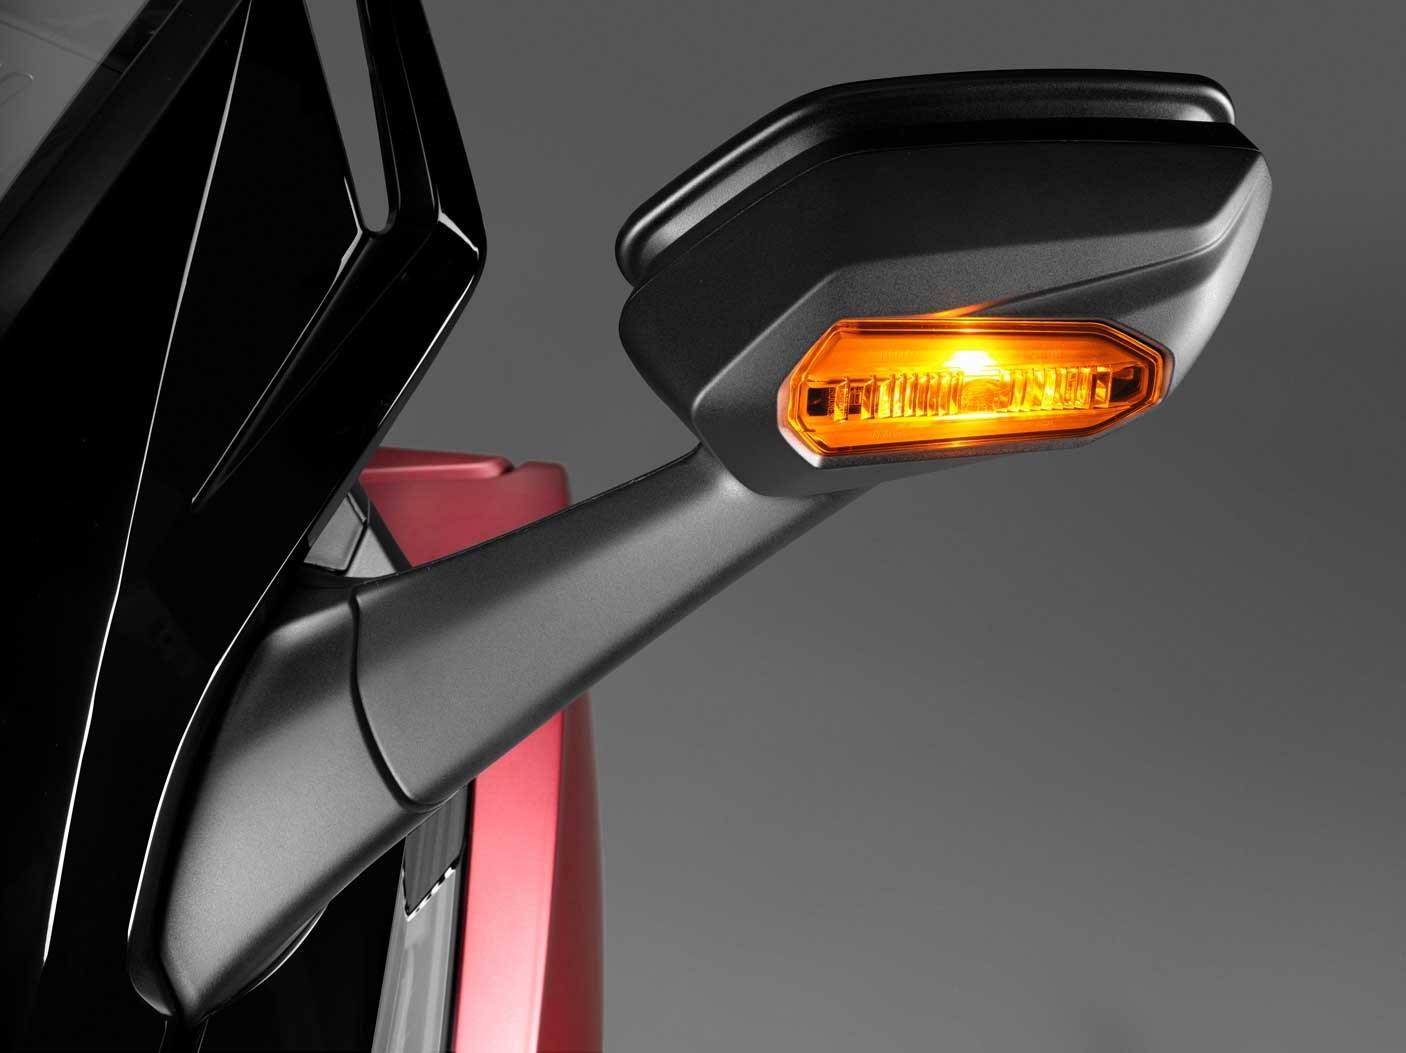 Honda announces 2018 update for Forza 125